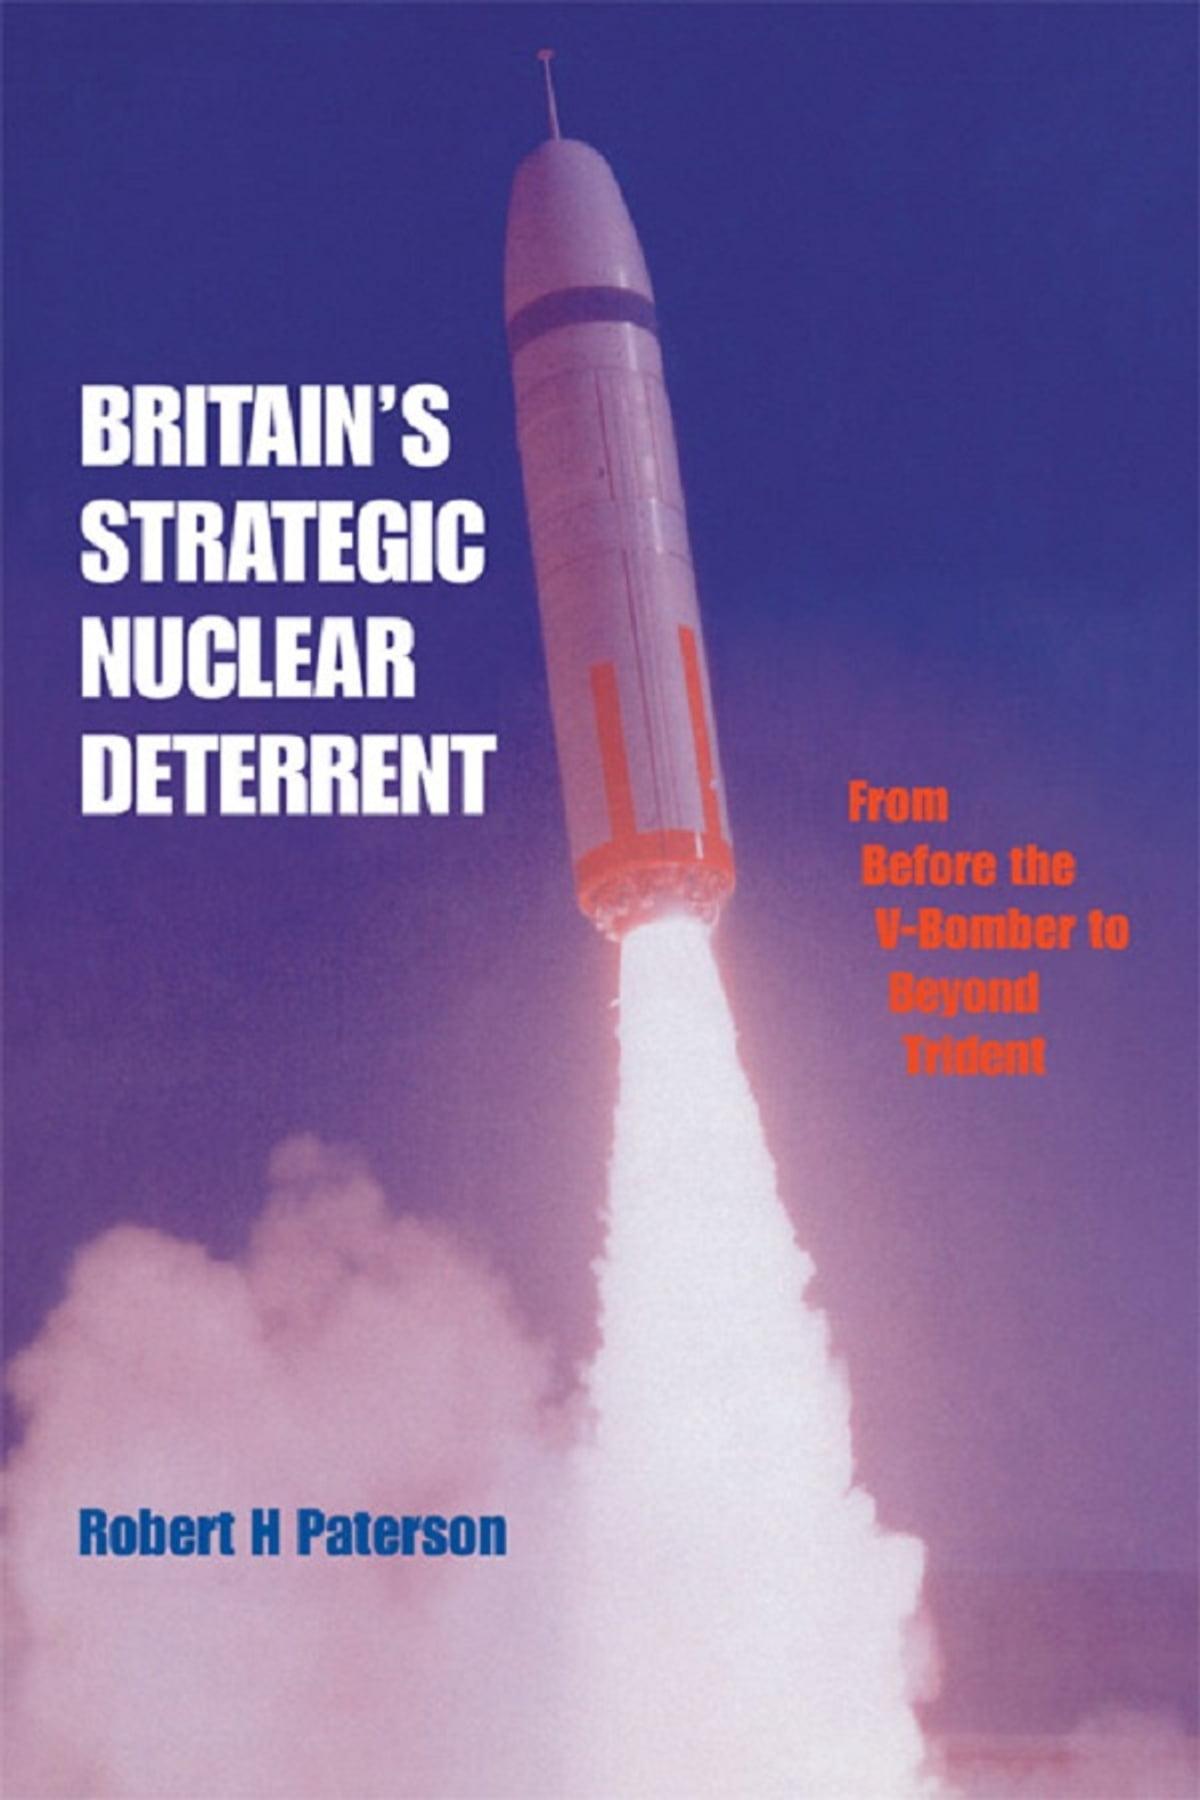 Britain's Strategic Nuclear Deterrent eBook by Robert H. Paterson - 9781136310447 | Rakuten Kobo